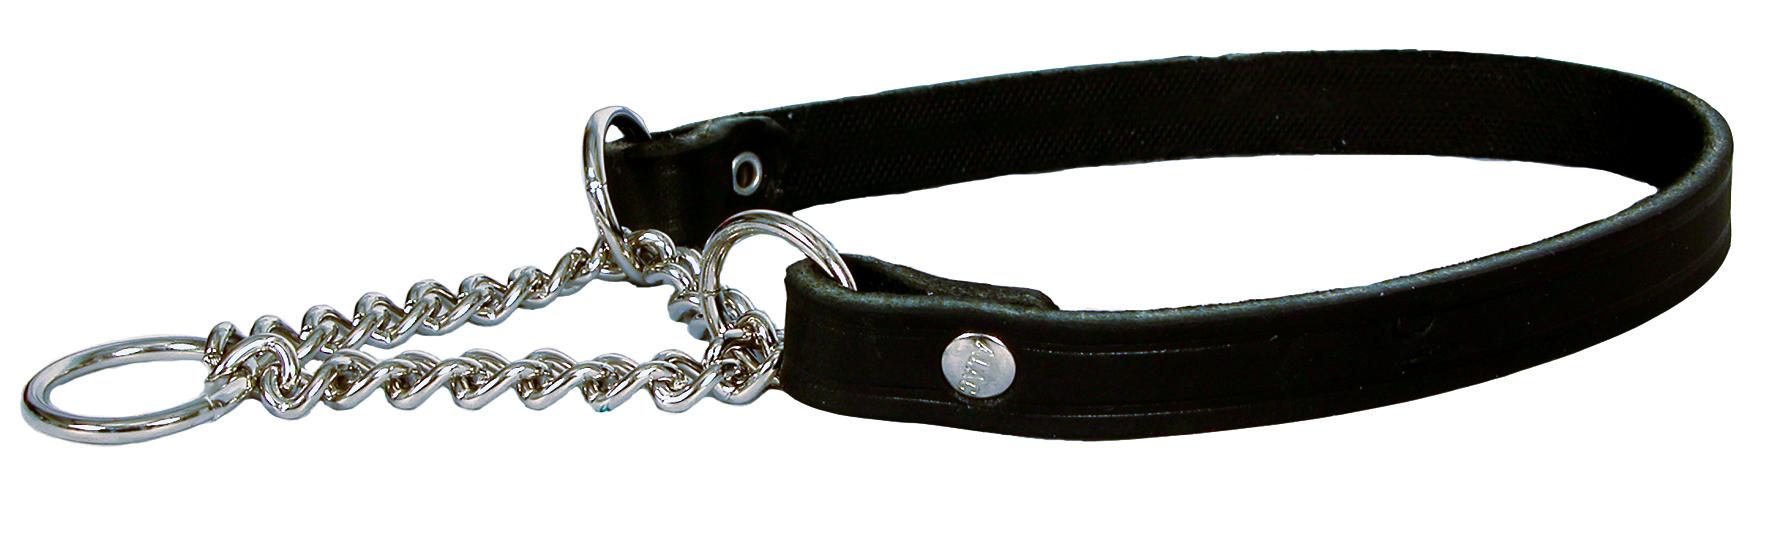 Alac Läderhalsband halvstryp XS 30cm